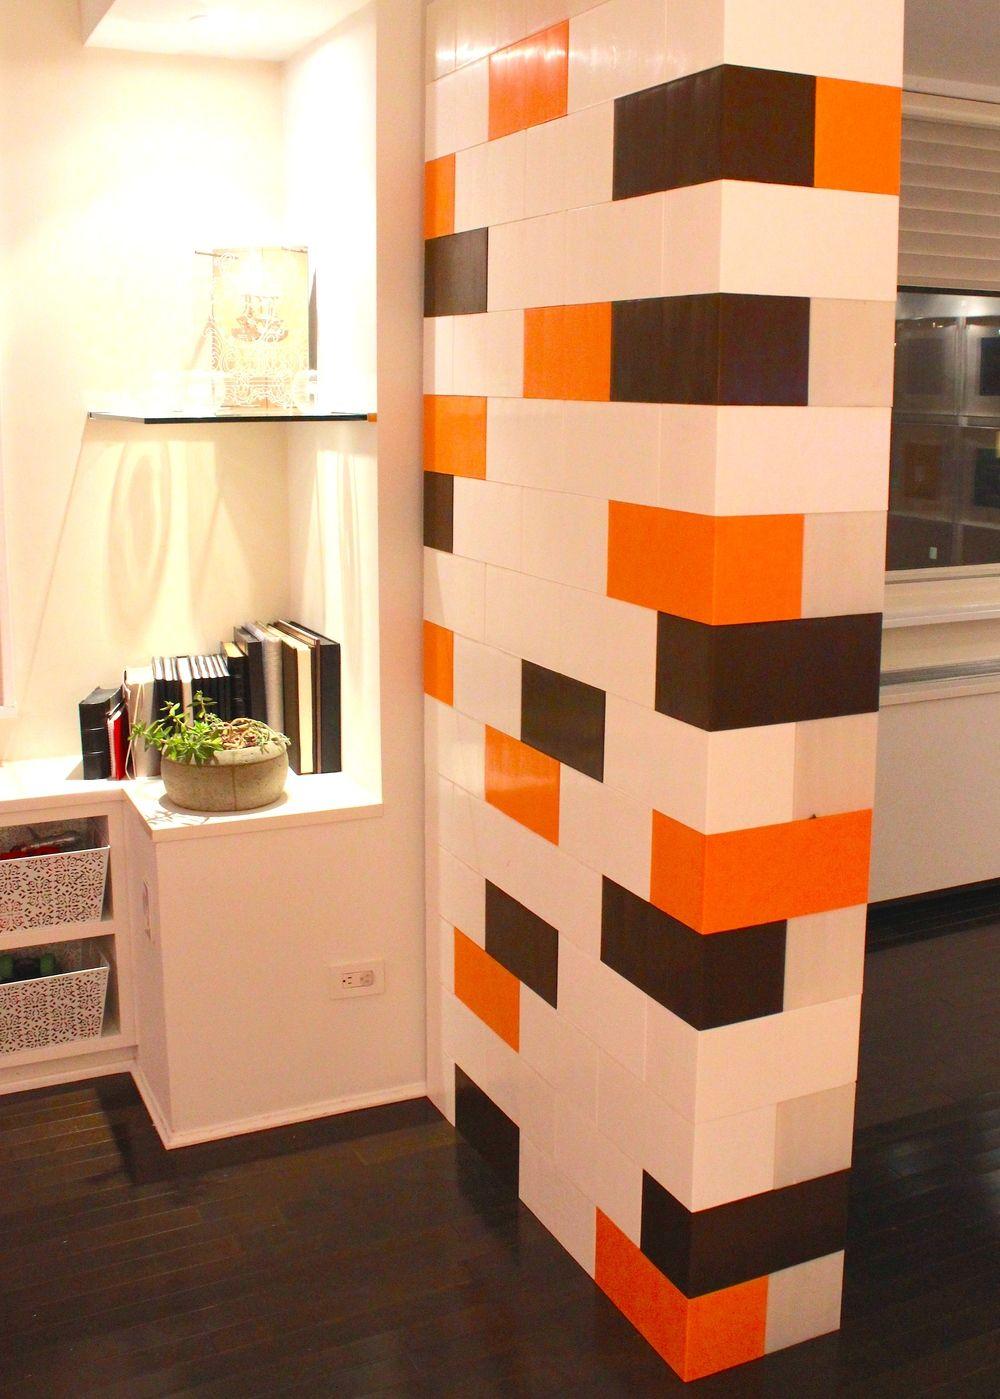 Everblock Lego Inspired Modular Building Bricks Walls